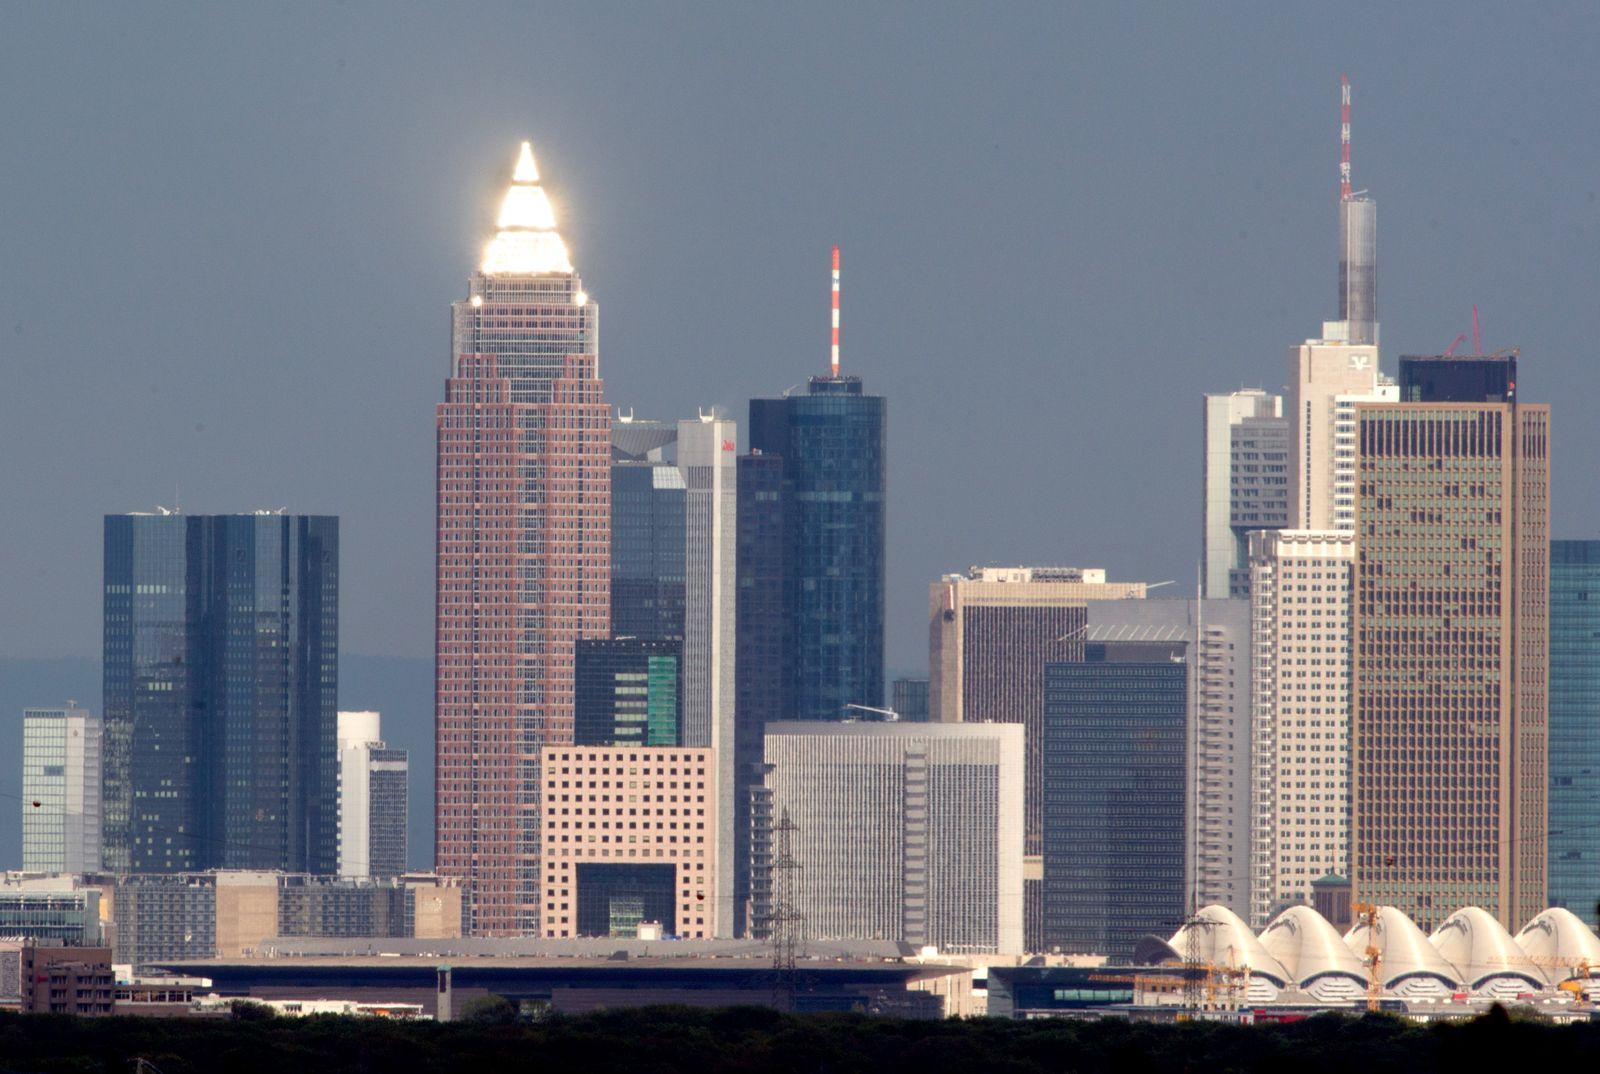 Banken-Skyline Frankfurt